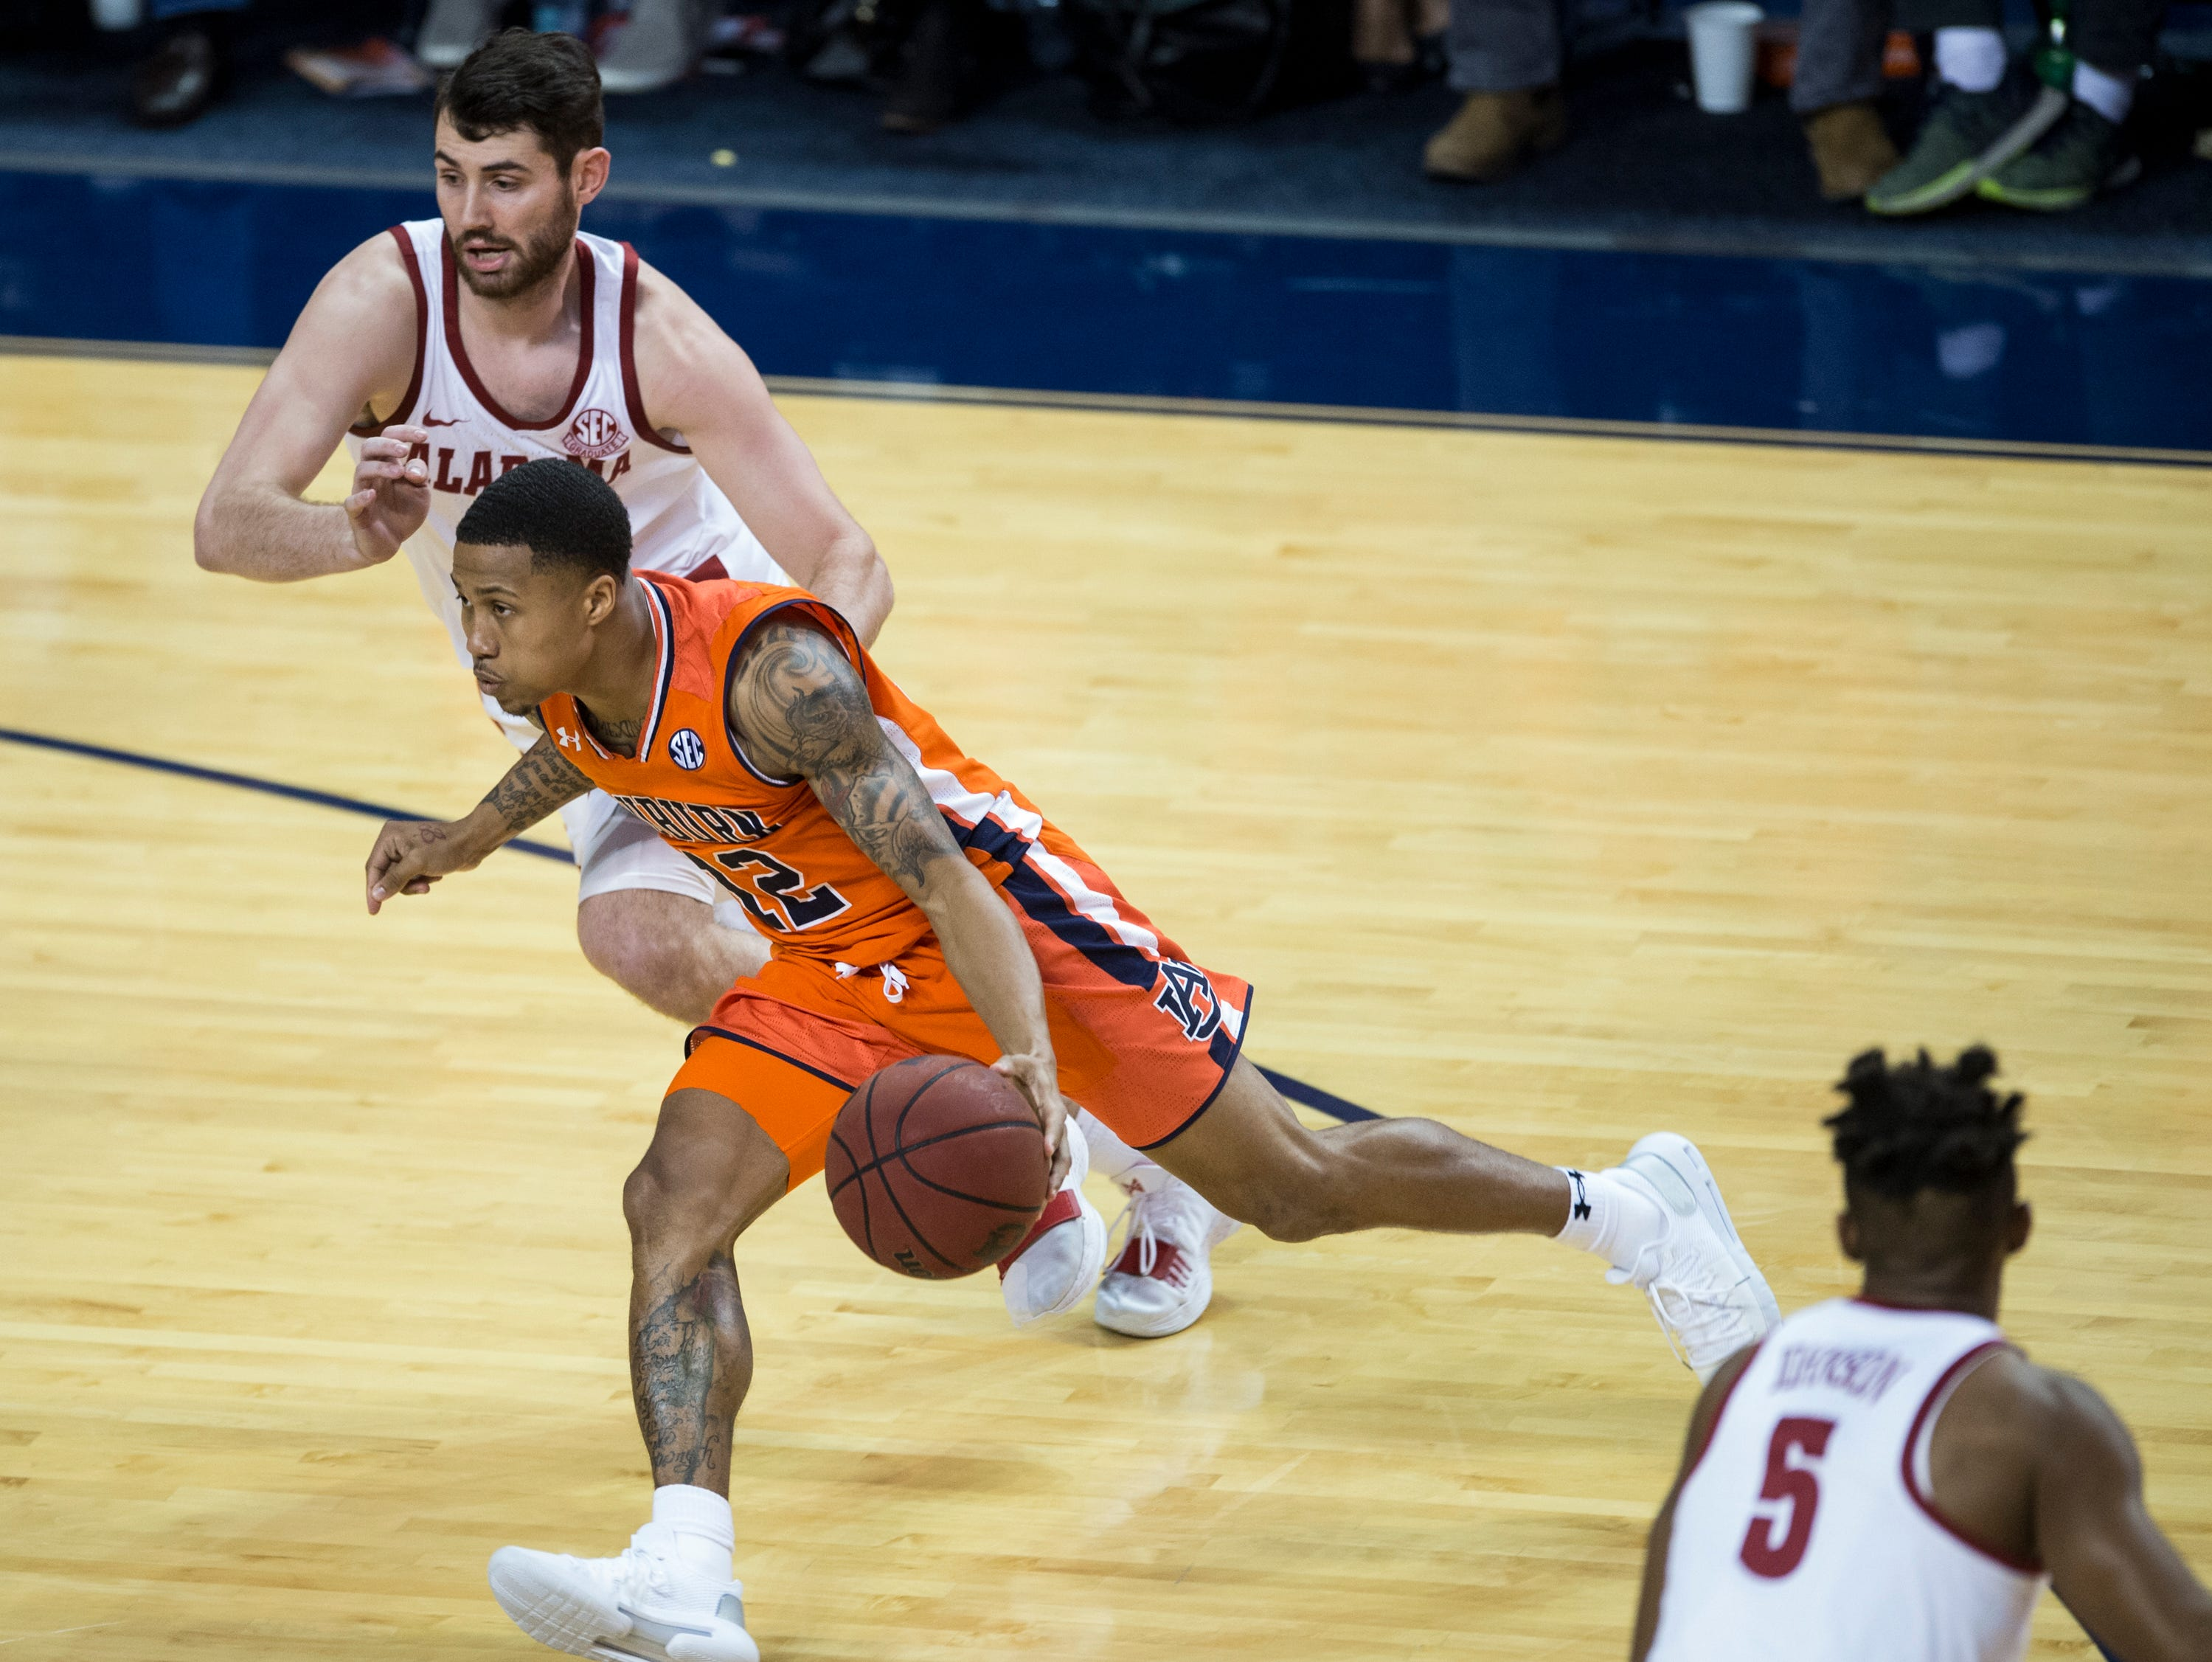 Auburn guard J'Von McCormick (12) drives the ball on Alabama guard Riley Norris (1) at Auburn Arena in Auburn, Ala., on Saturday, Feb. 2, 2019. Auburn defeated Alabama 84-63.